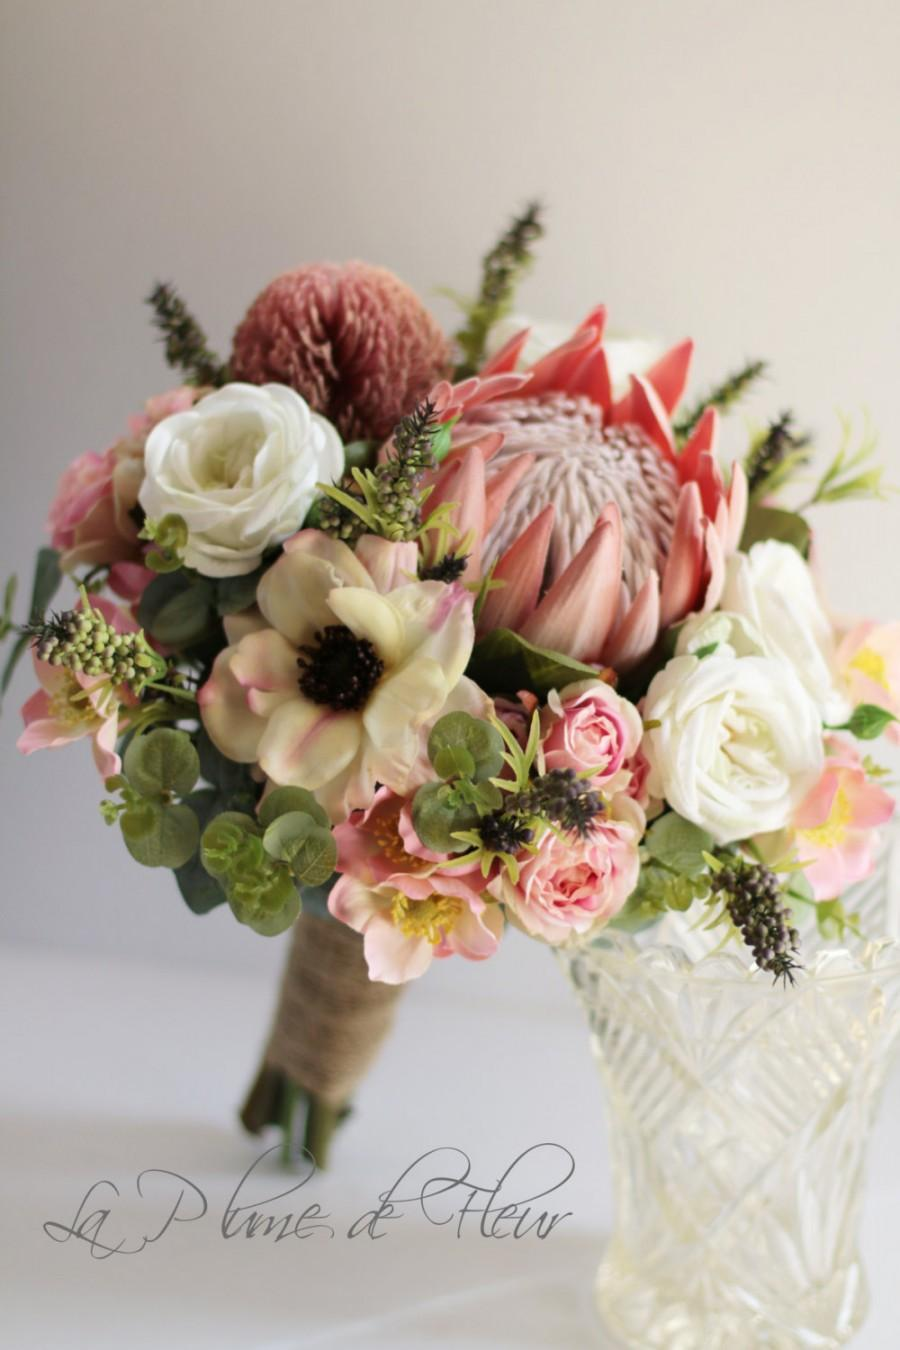 Свадьба - Melba - Bride's bouquet. Australian natives and cottage flowers.  Protea, banksia, gum, roses, anemones, wildflowers & wild pepper berries.